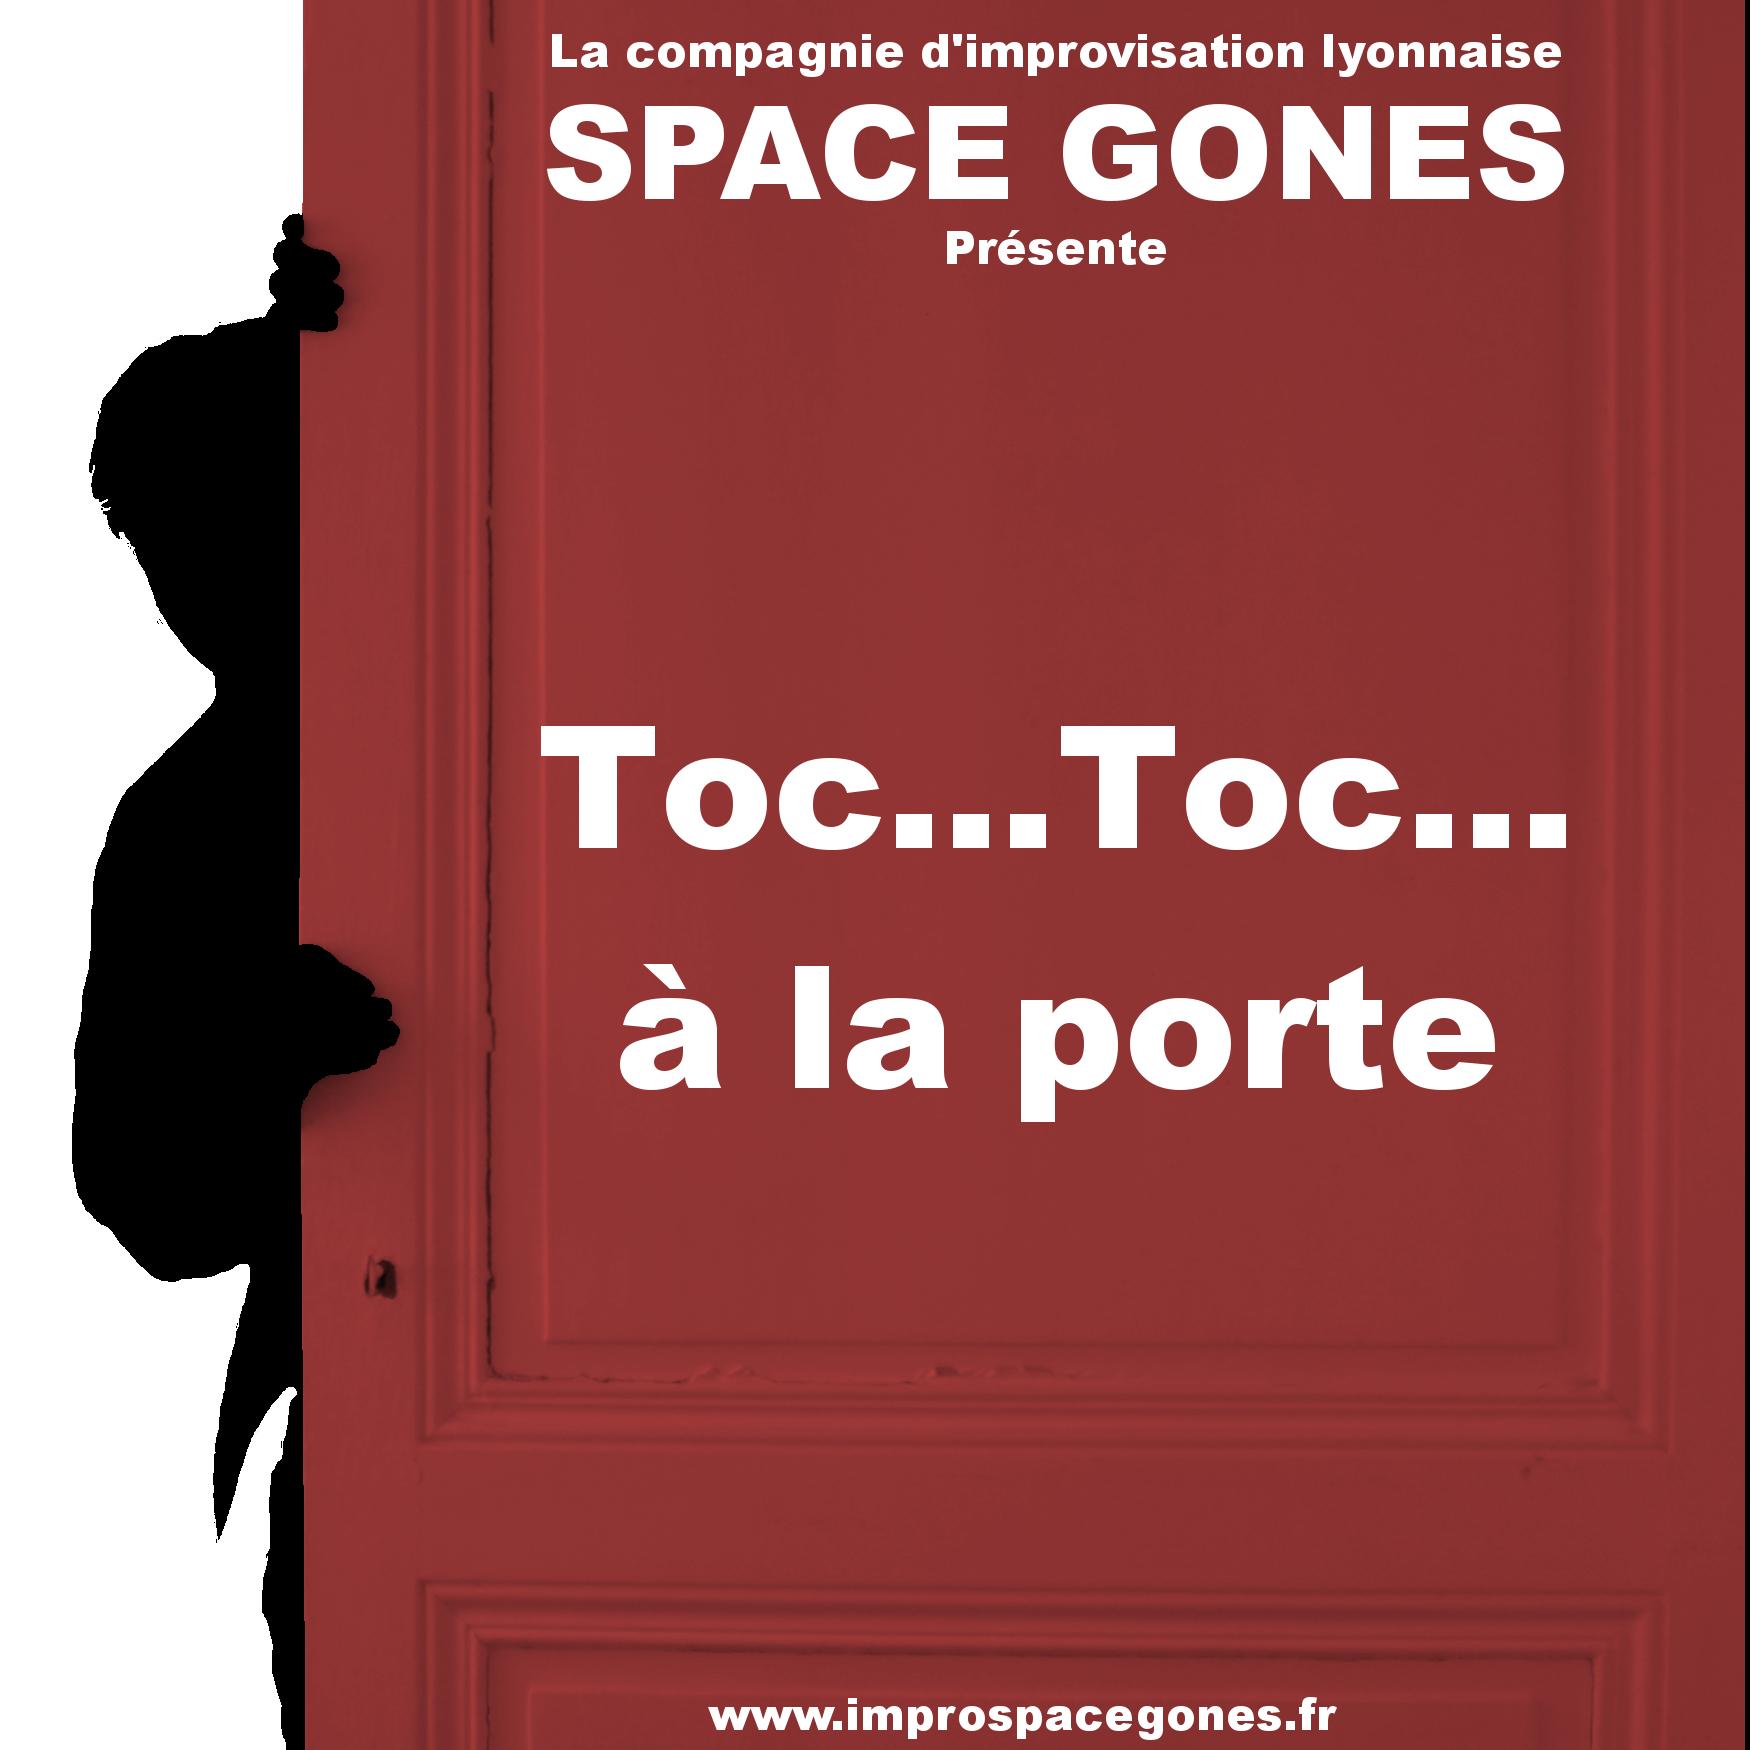 Improvisation Théâtre Improvisation Lyon Theatre Improvisation Bordeaux declarations_dimpro_affiche